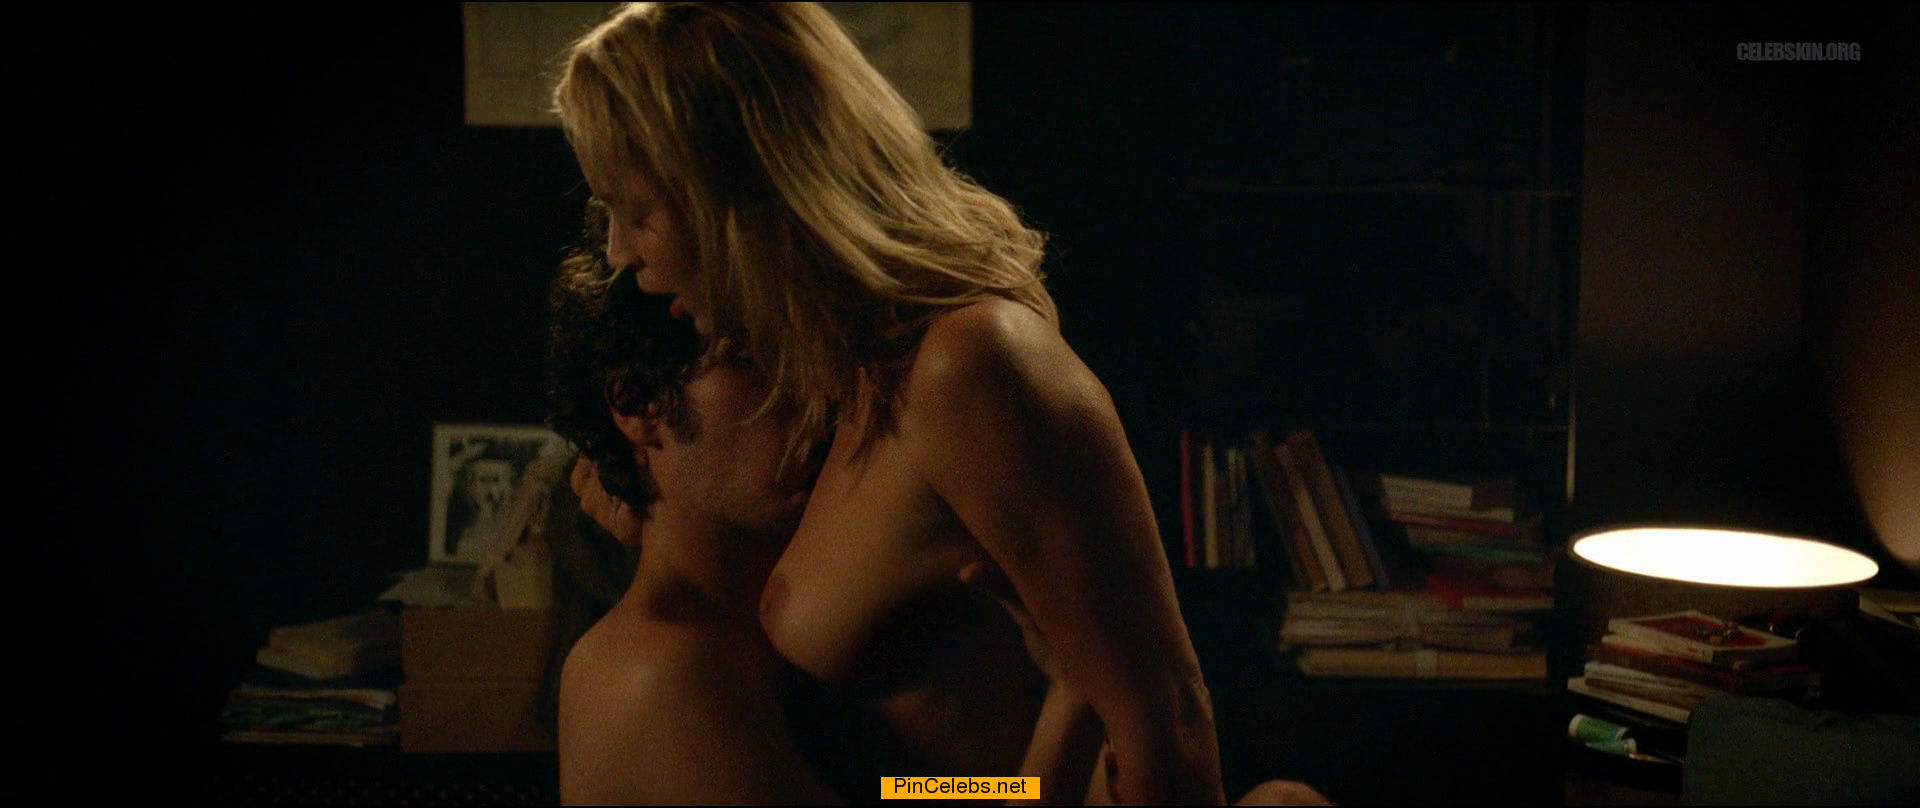 julia roberts nudes